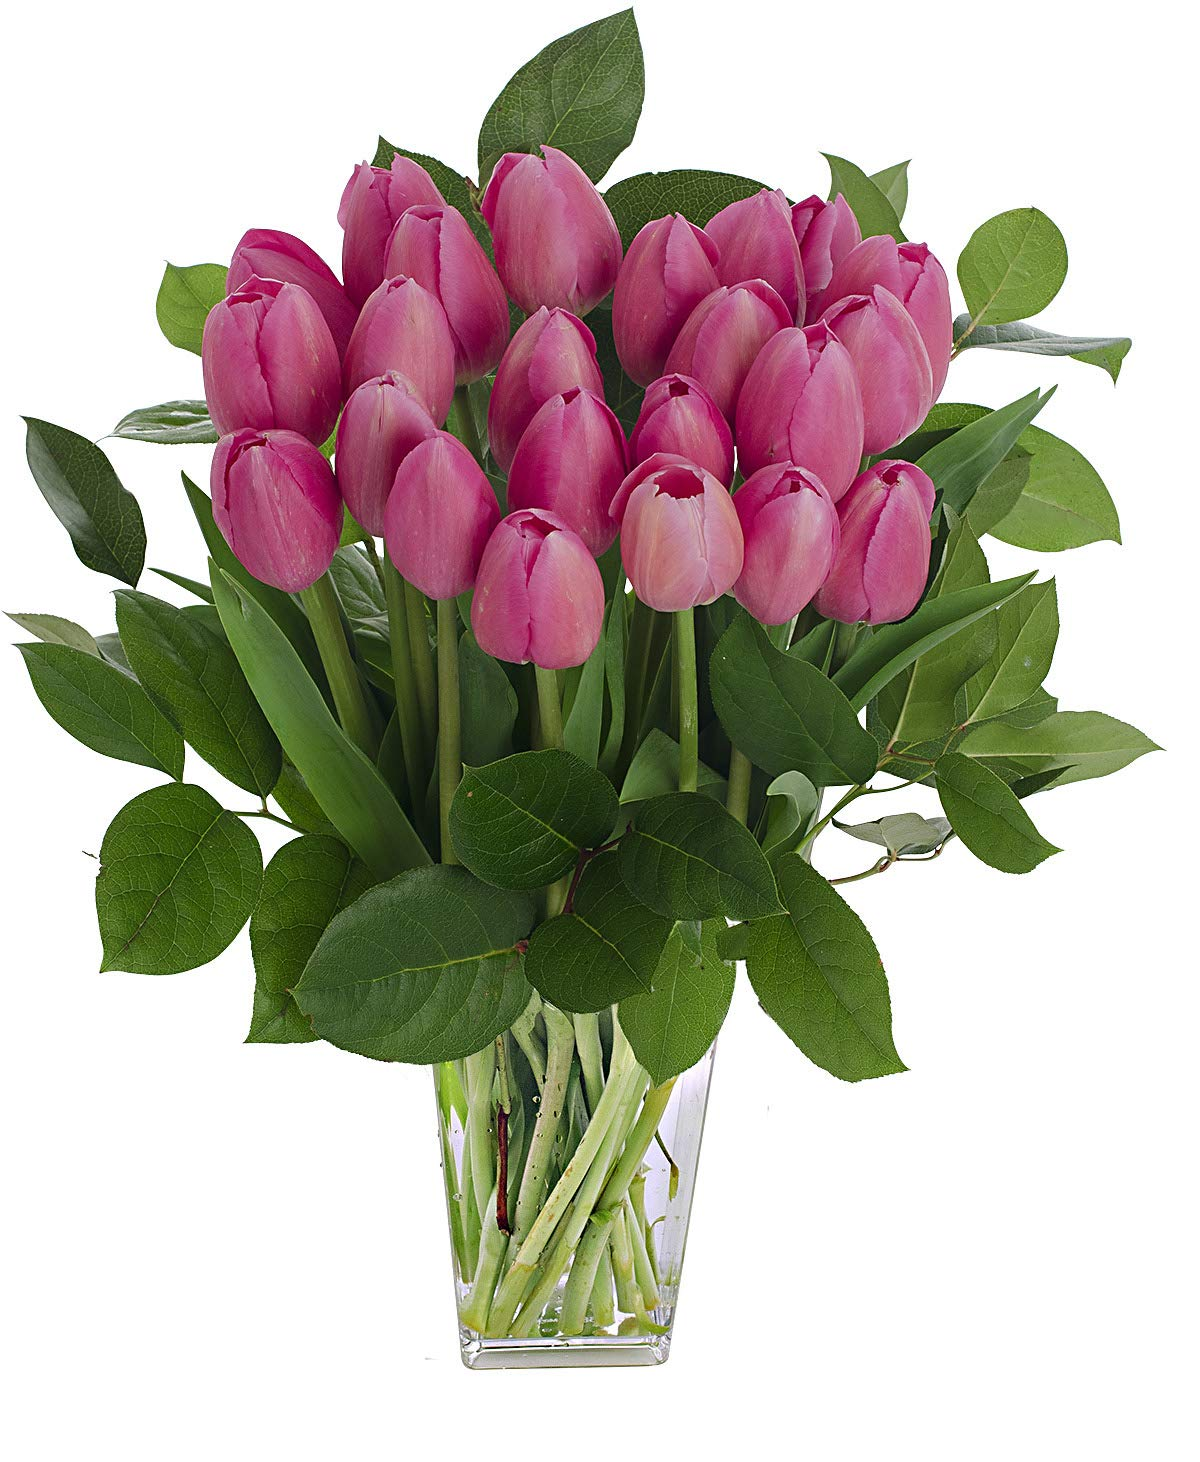 Stargazer Barn - Flamenco Bouquet - 2 Dozen Bright Pink Tulips With Clear Vase - Farm Fresh